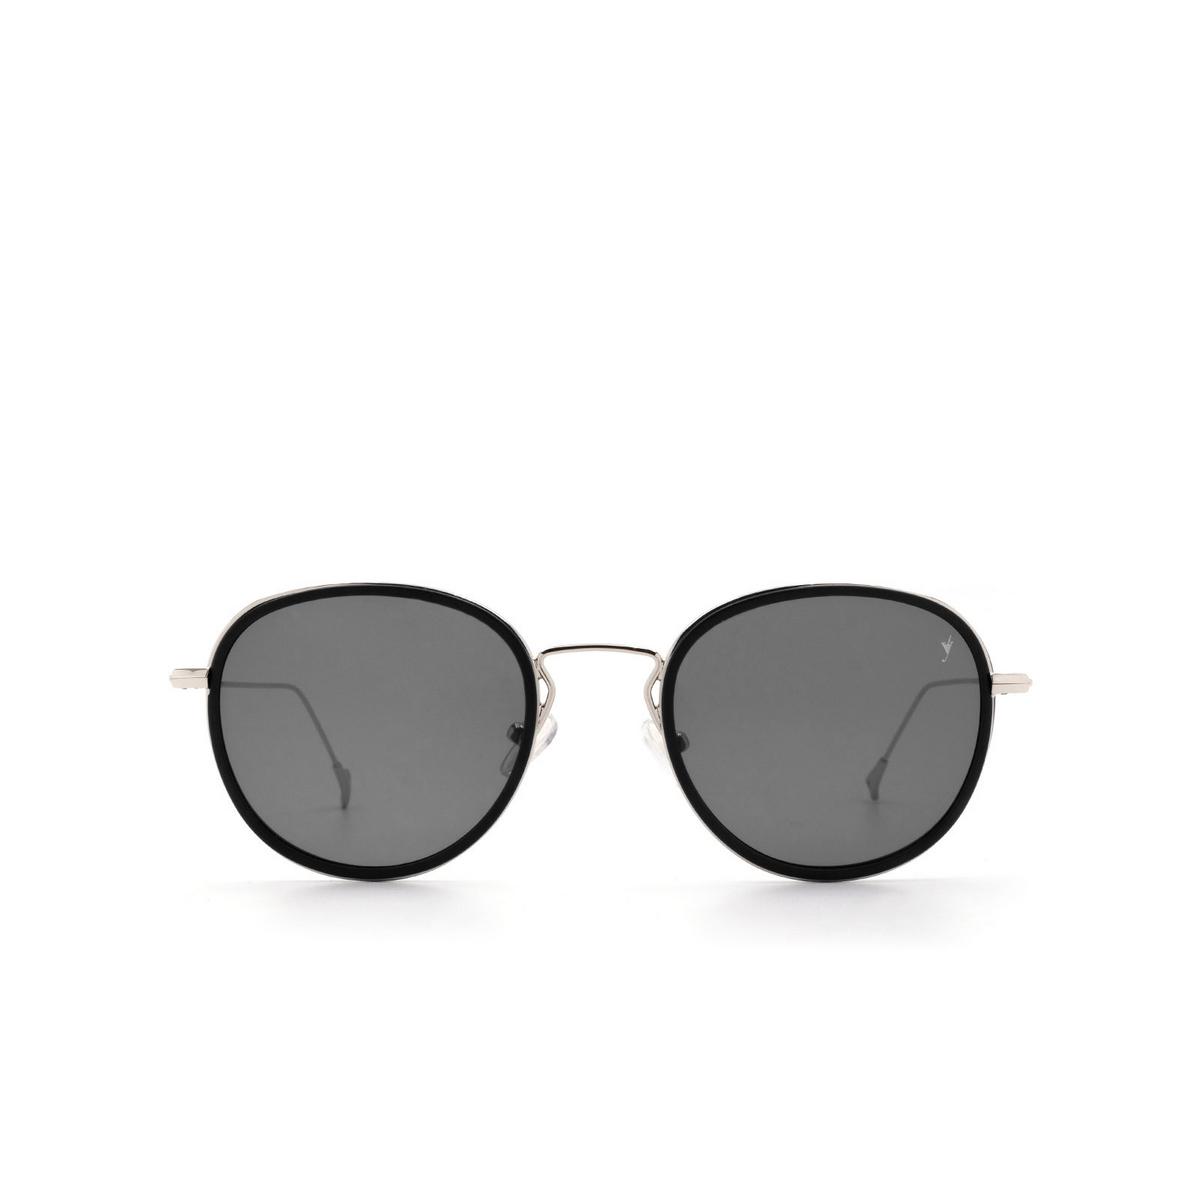 eyepetizer-pier-cb-1-7